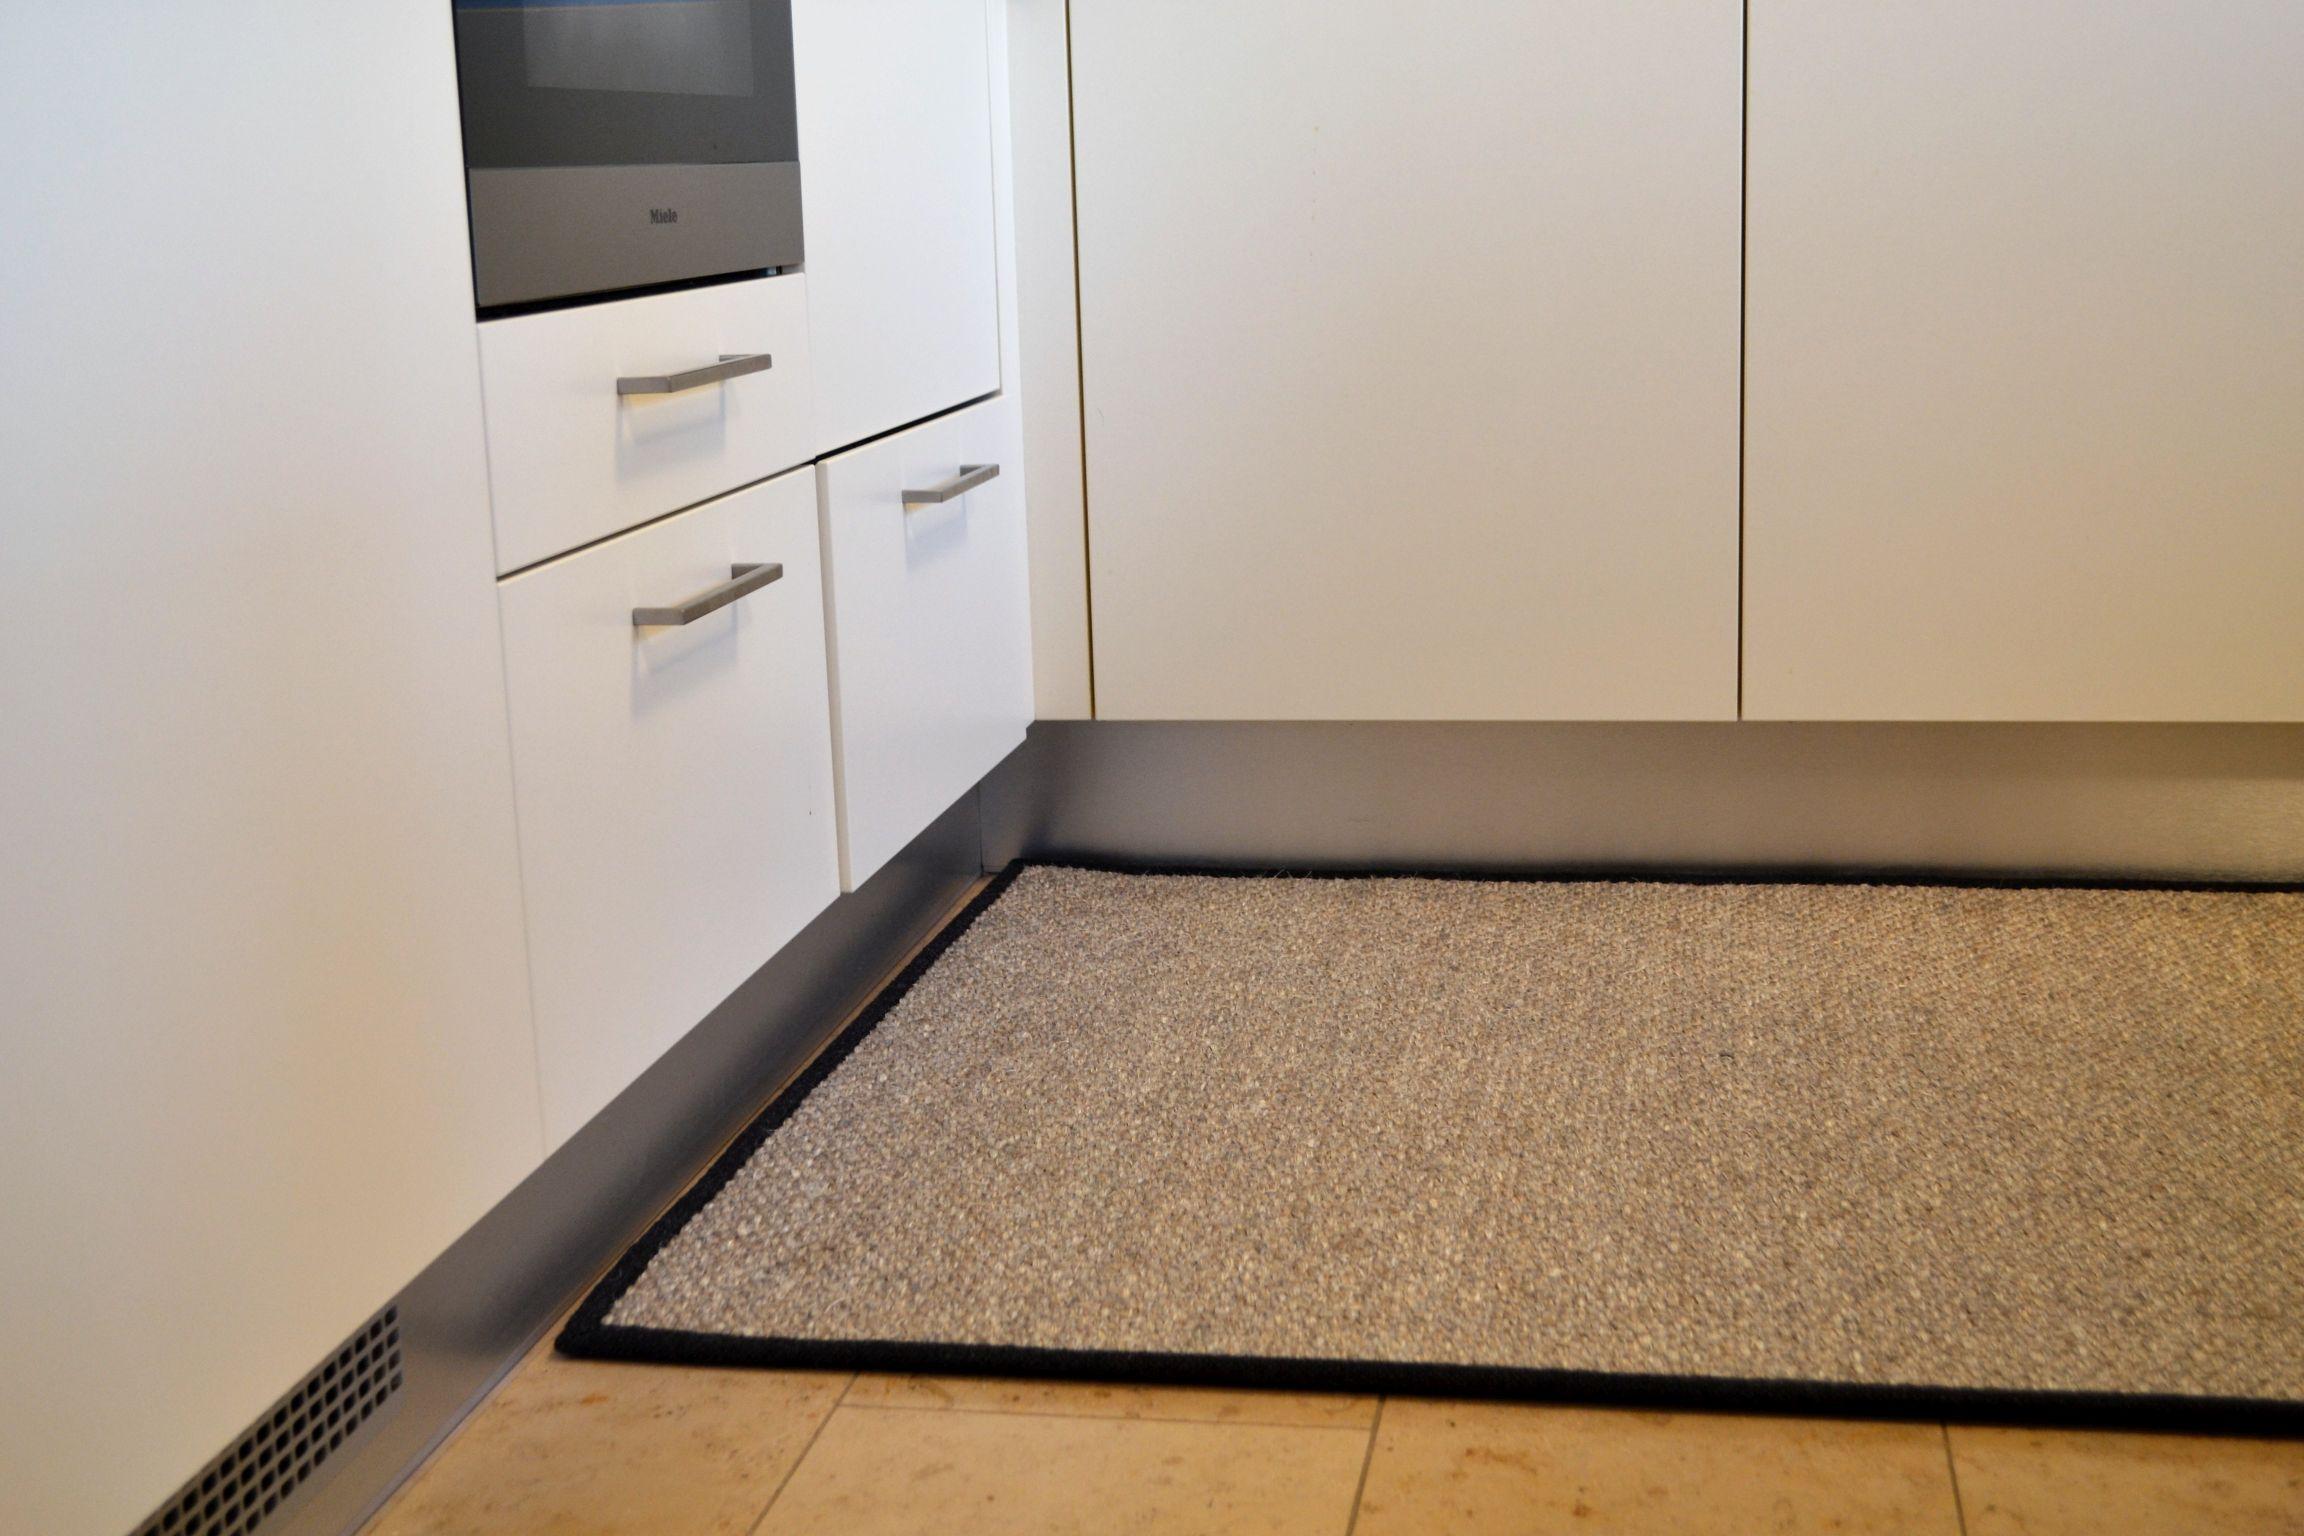 sisalteppich gembinski teppiche. Black Bedroom Furniture Sets. Home Design Ideas